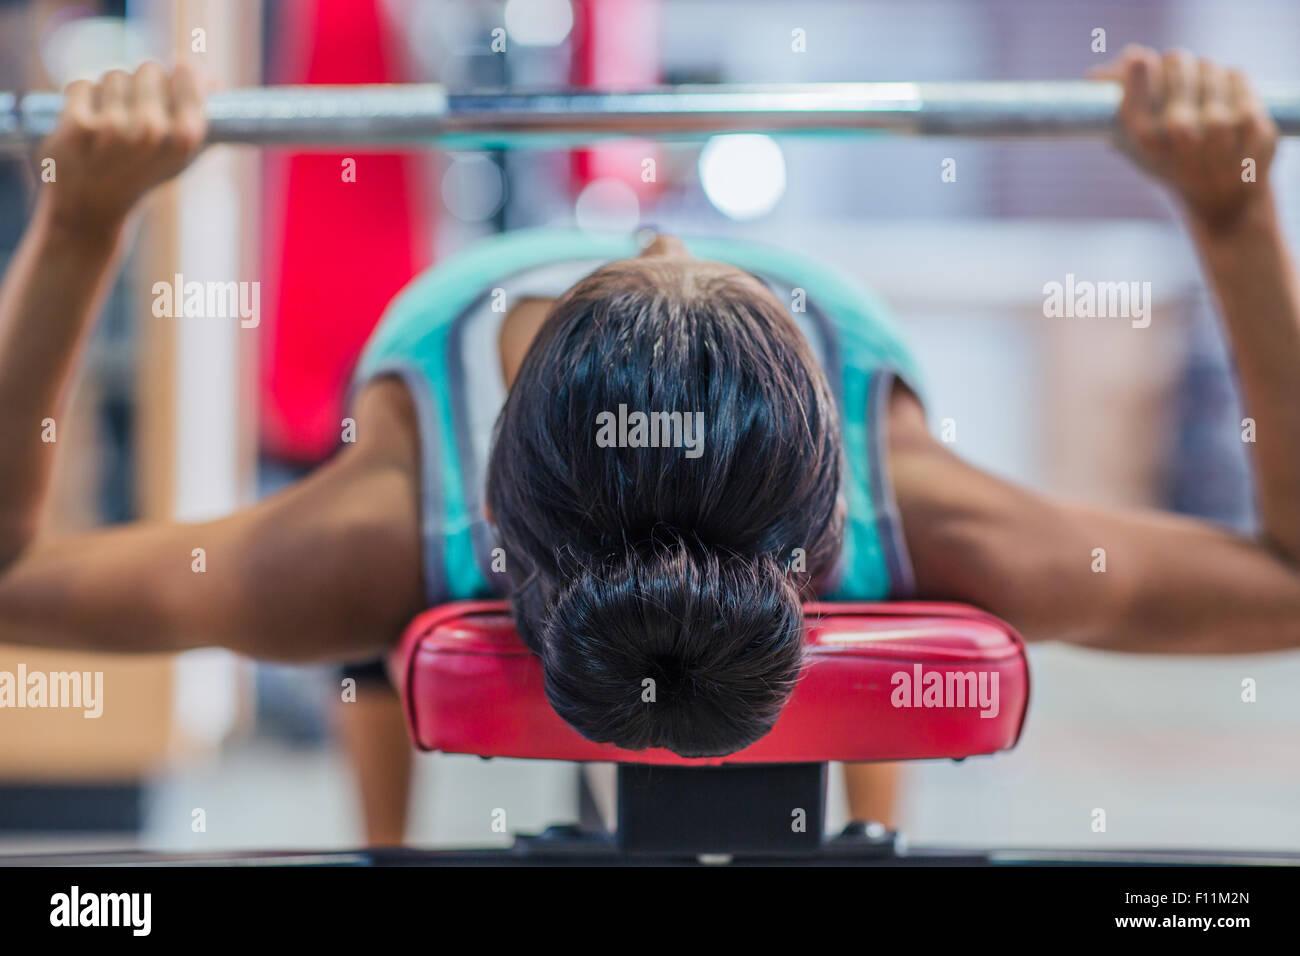 Junge Frau Training mit Langhantel auf der Bank im Fitness-Studio Stockbild